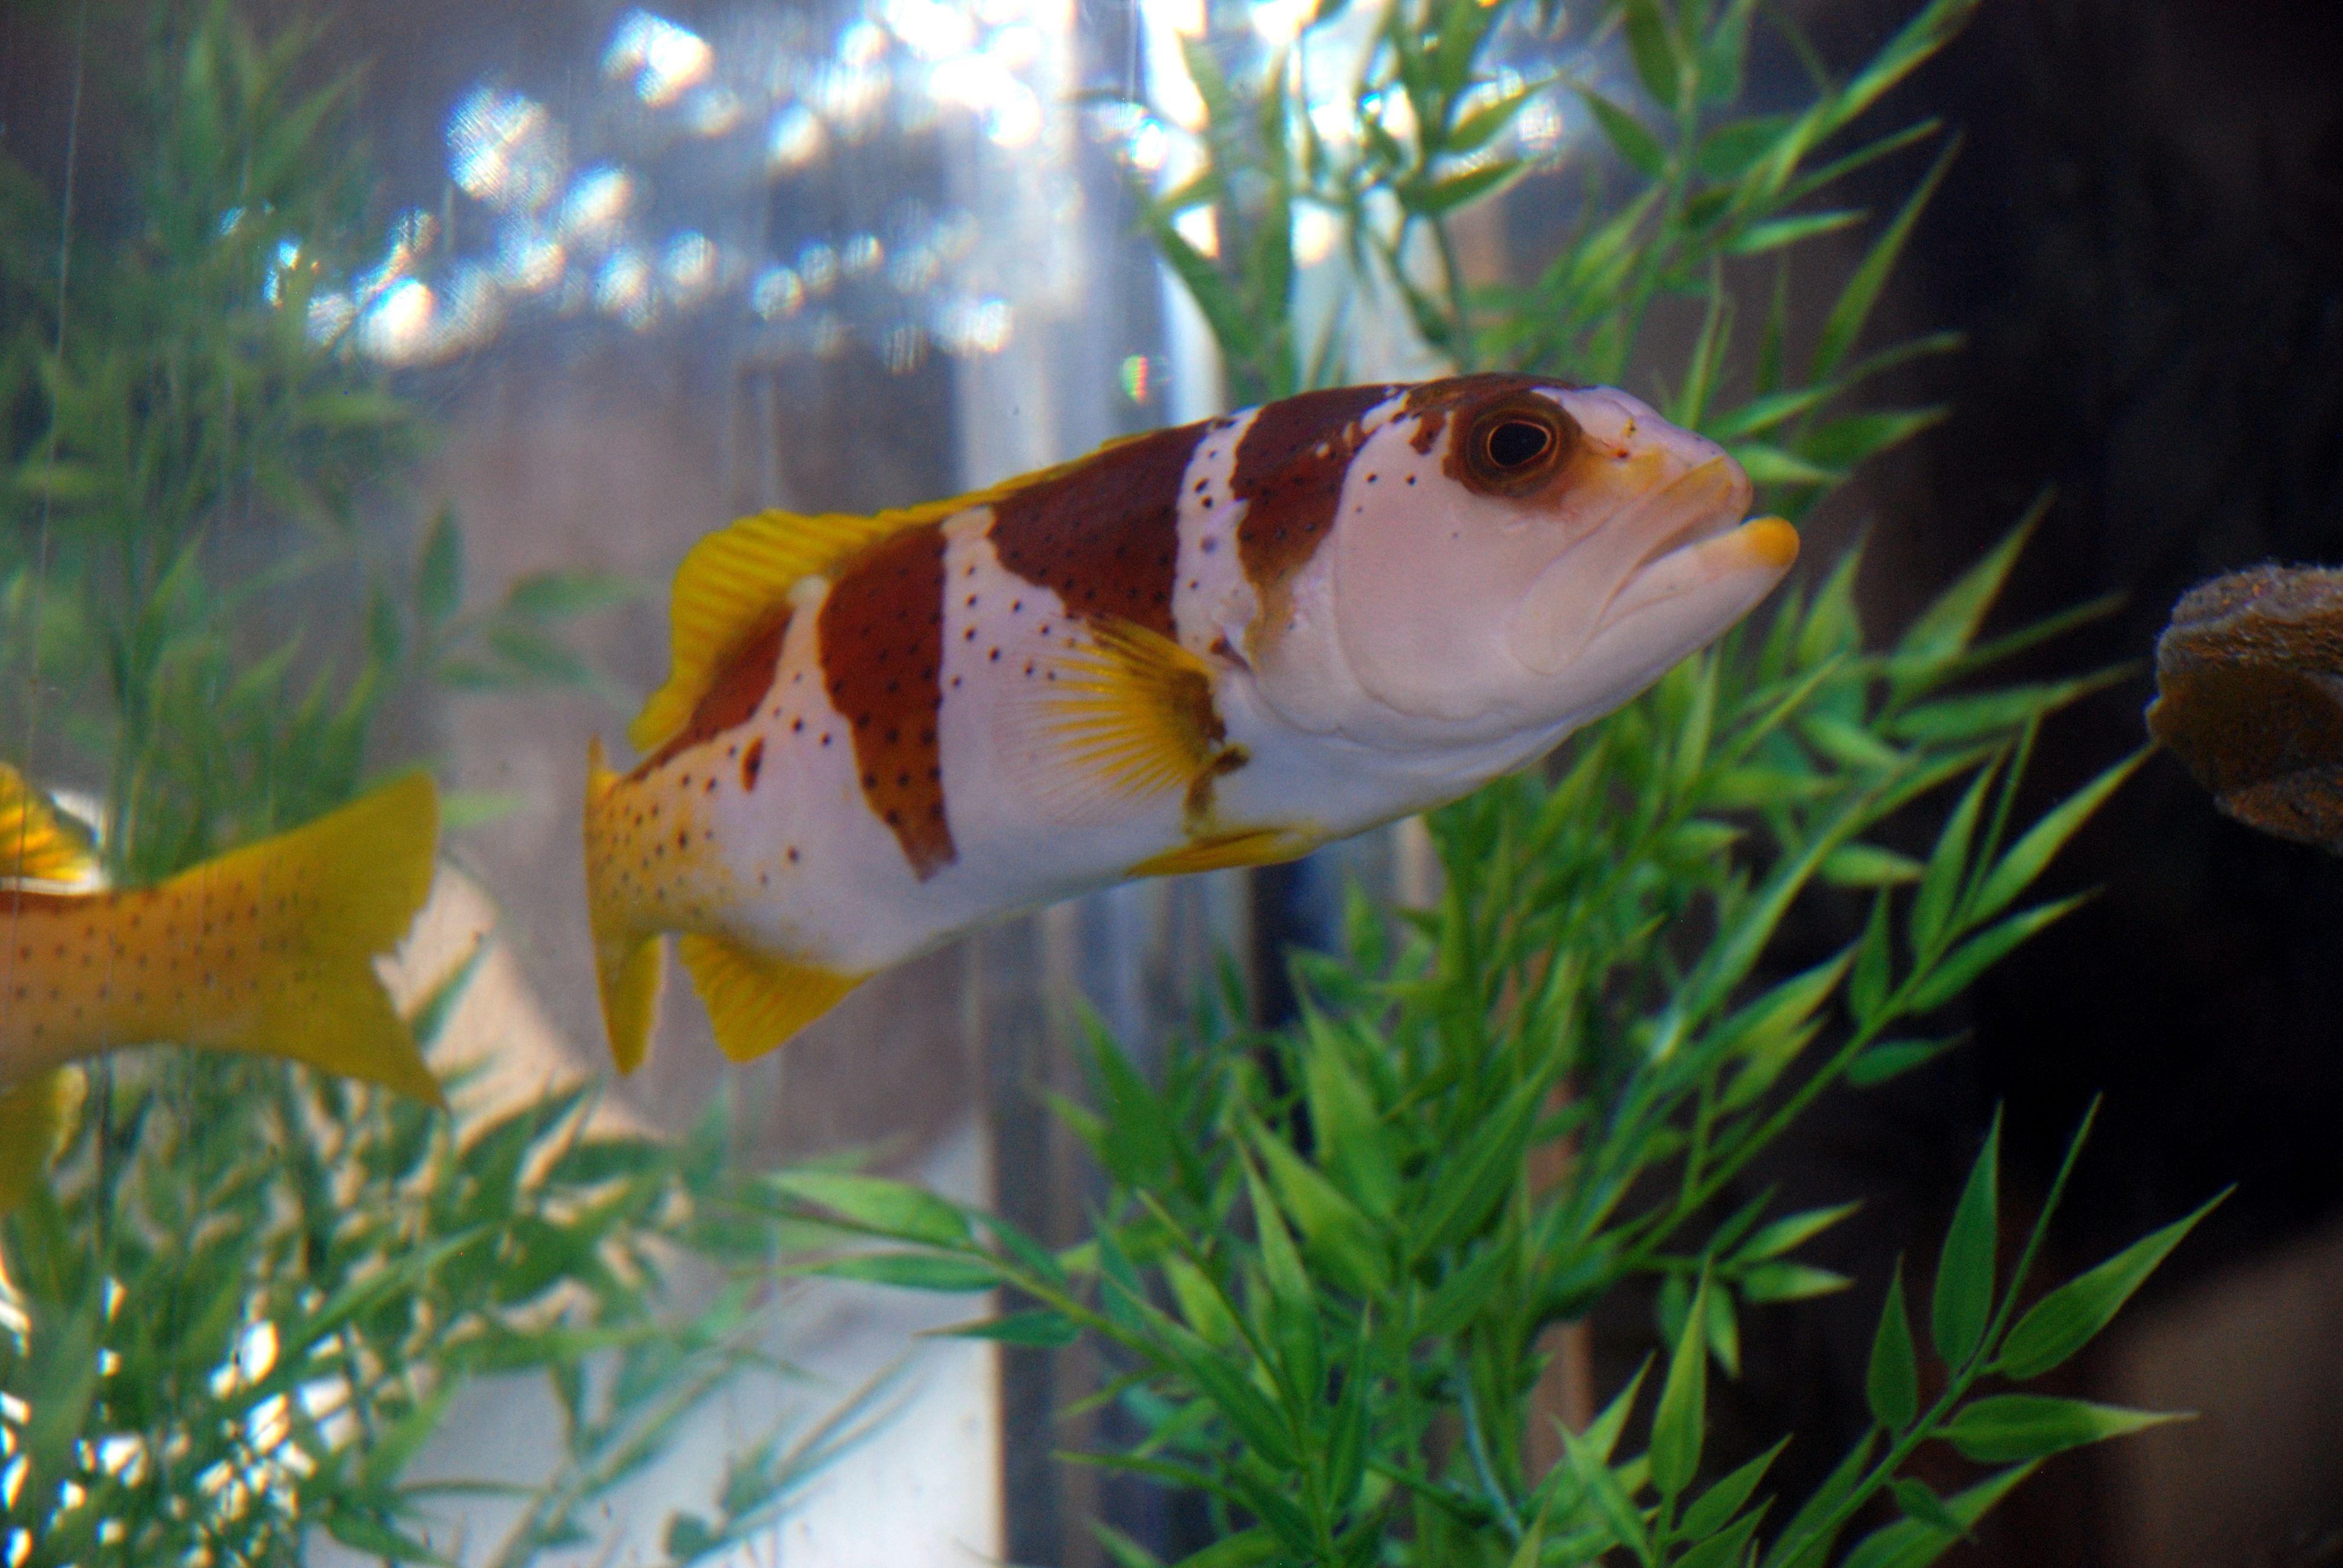 Large grouper in a fish only aquarium transforming aquariums into